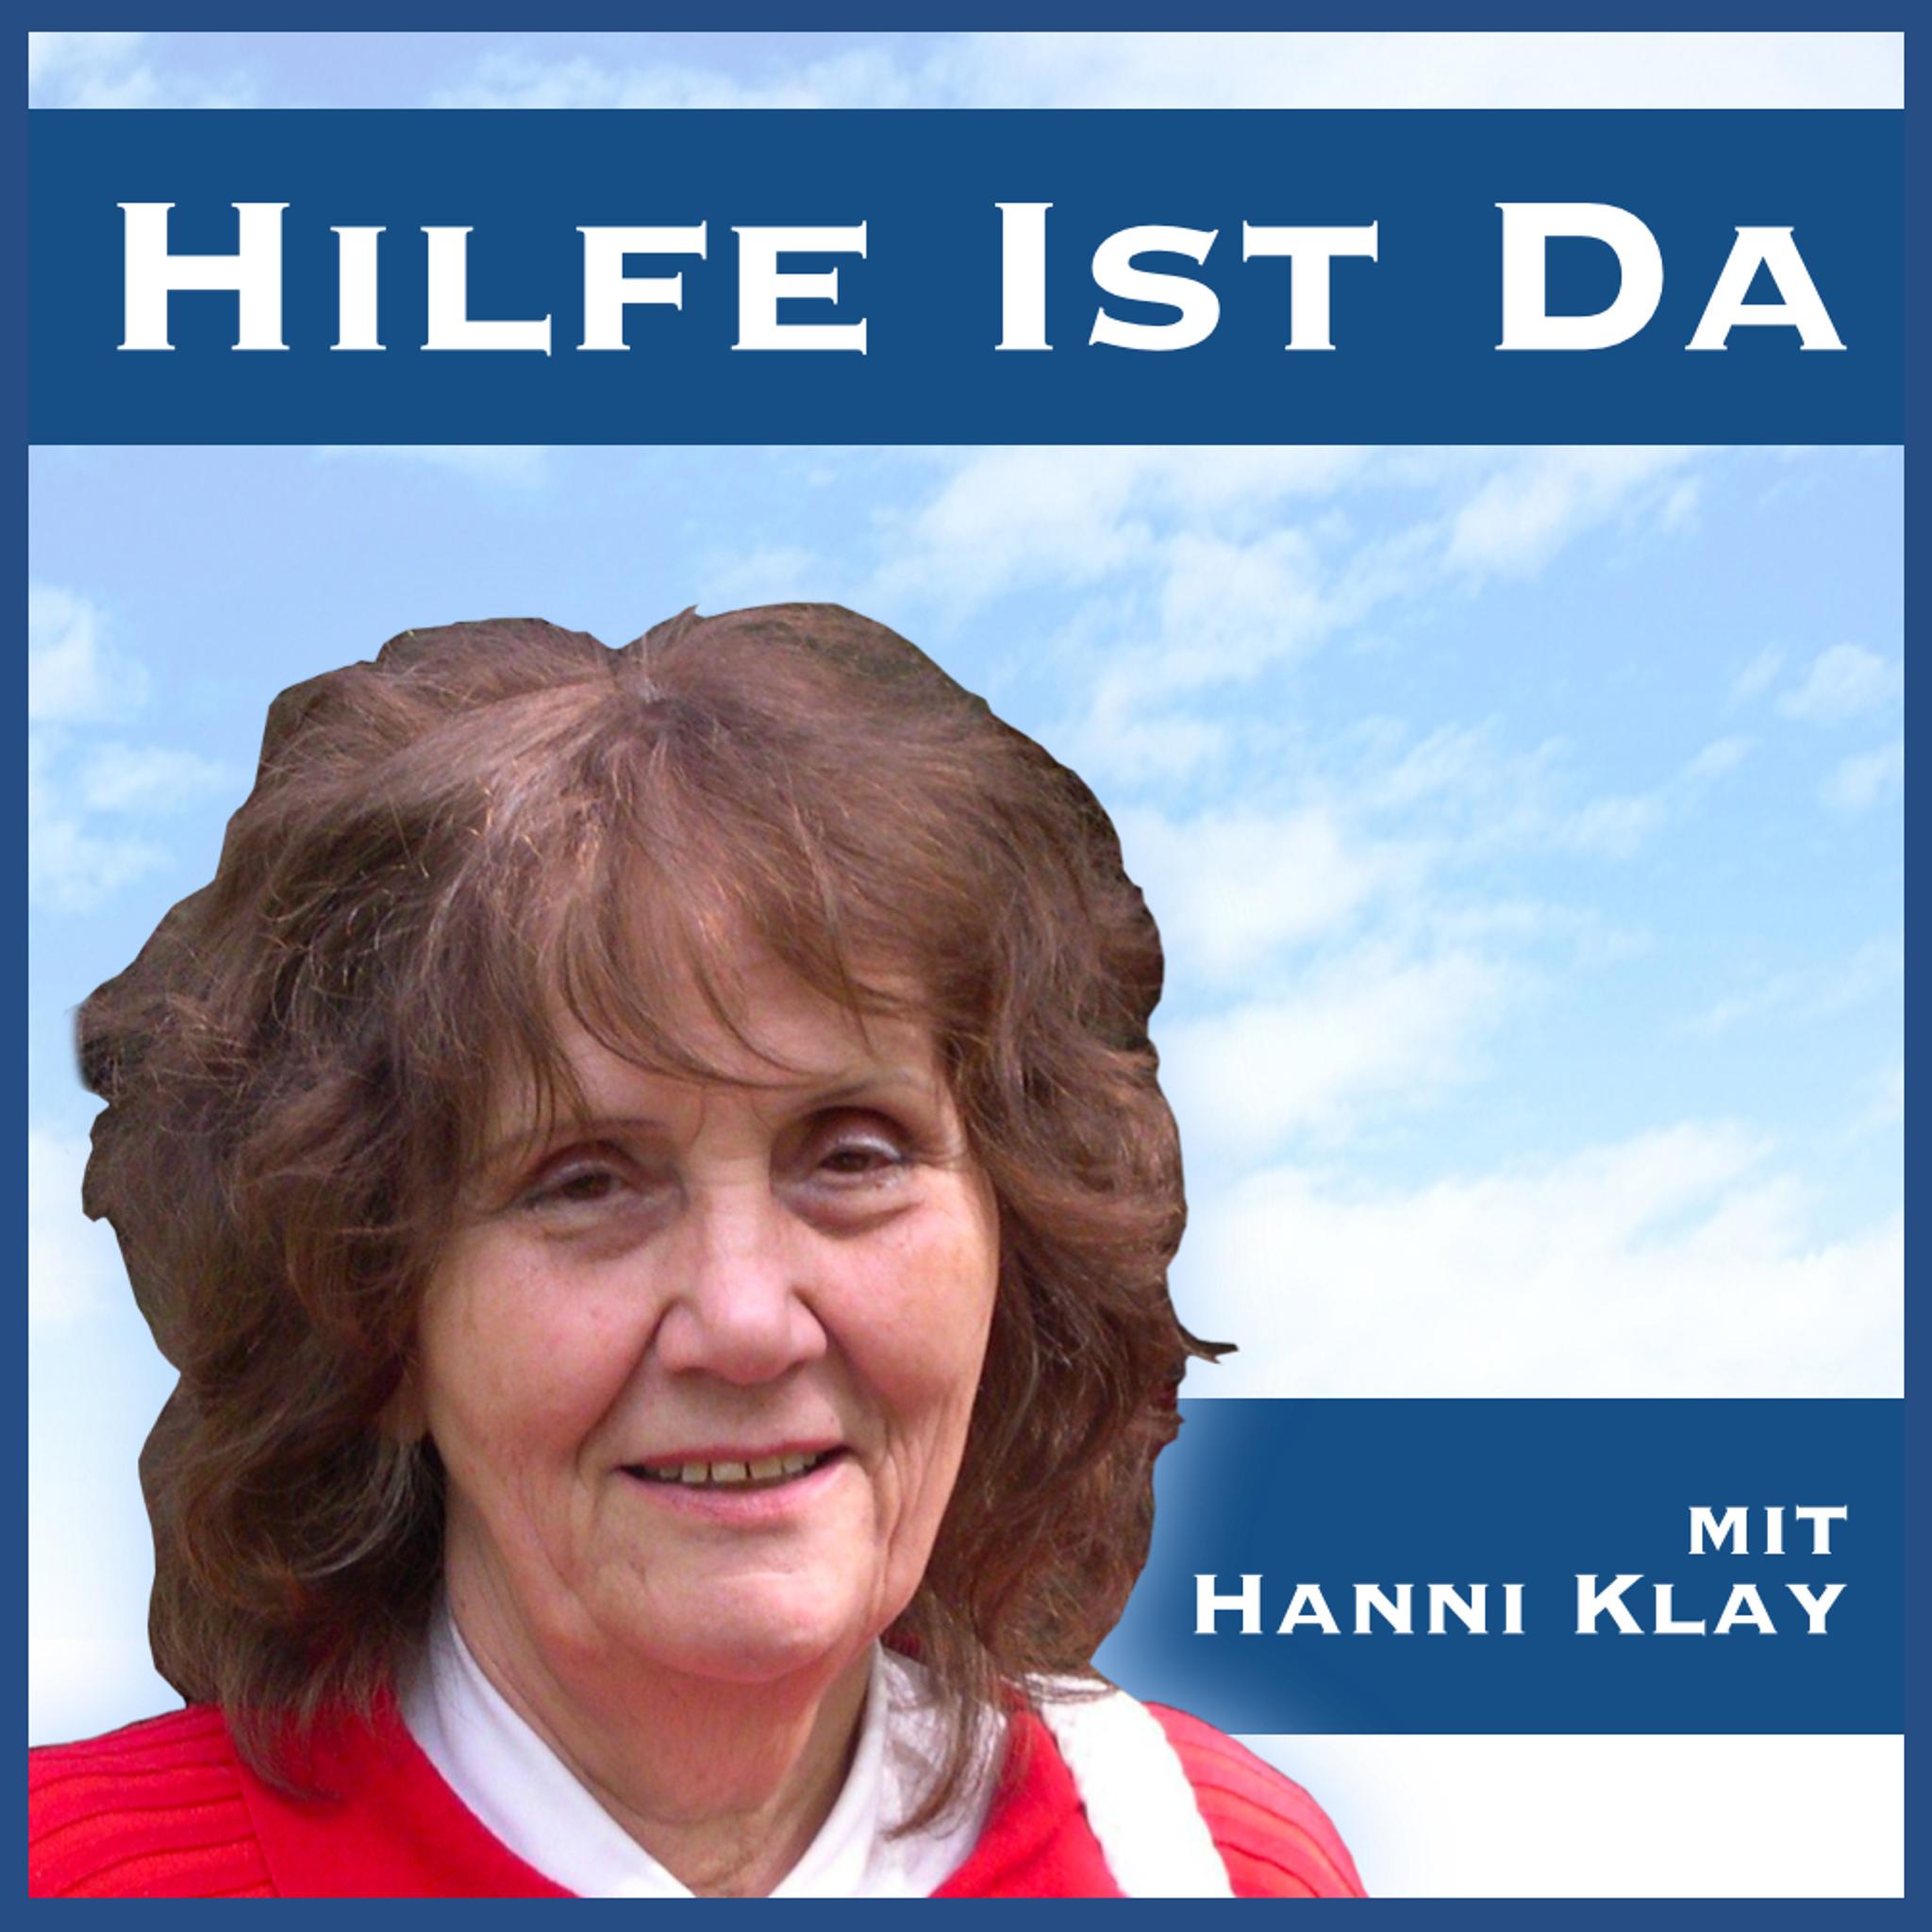 Hilfe ist da, nimm sie wahr – Lebenshilfe | Geistige Welt | Hanni Klay